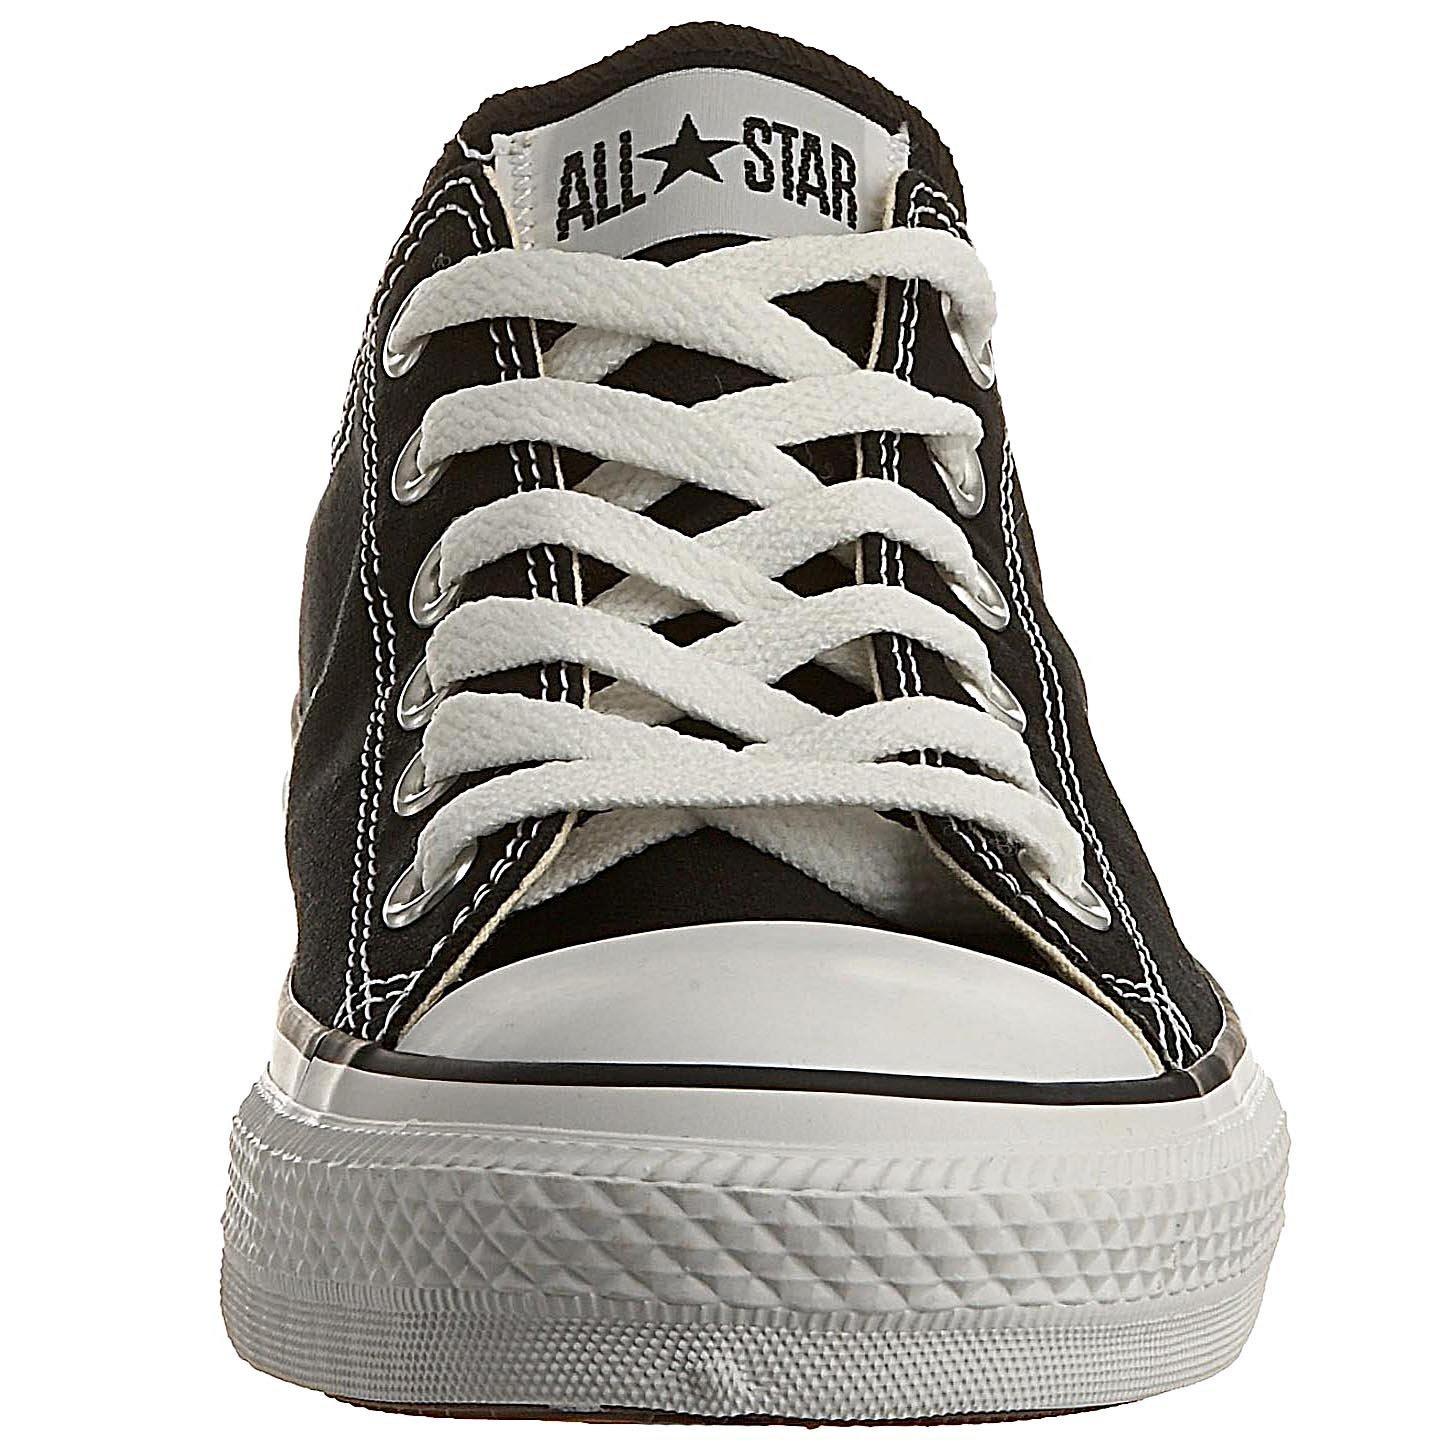 Converse Shoes For Women | Sport Shoes Unlimited